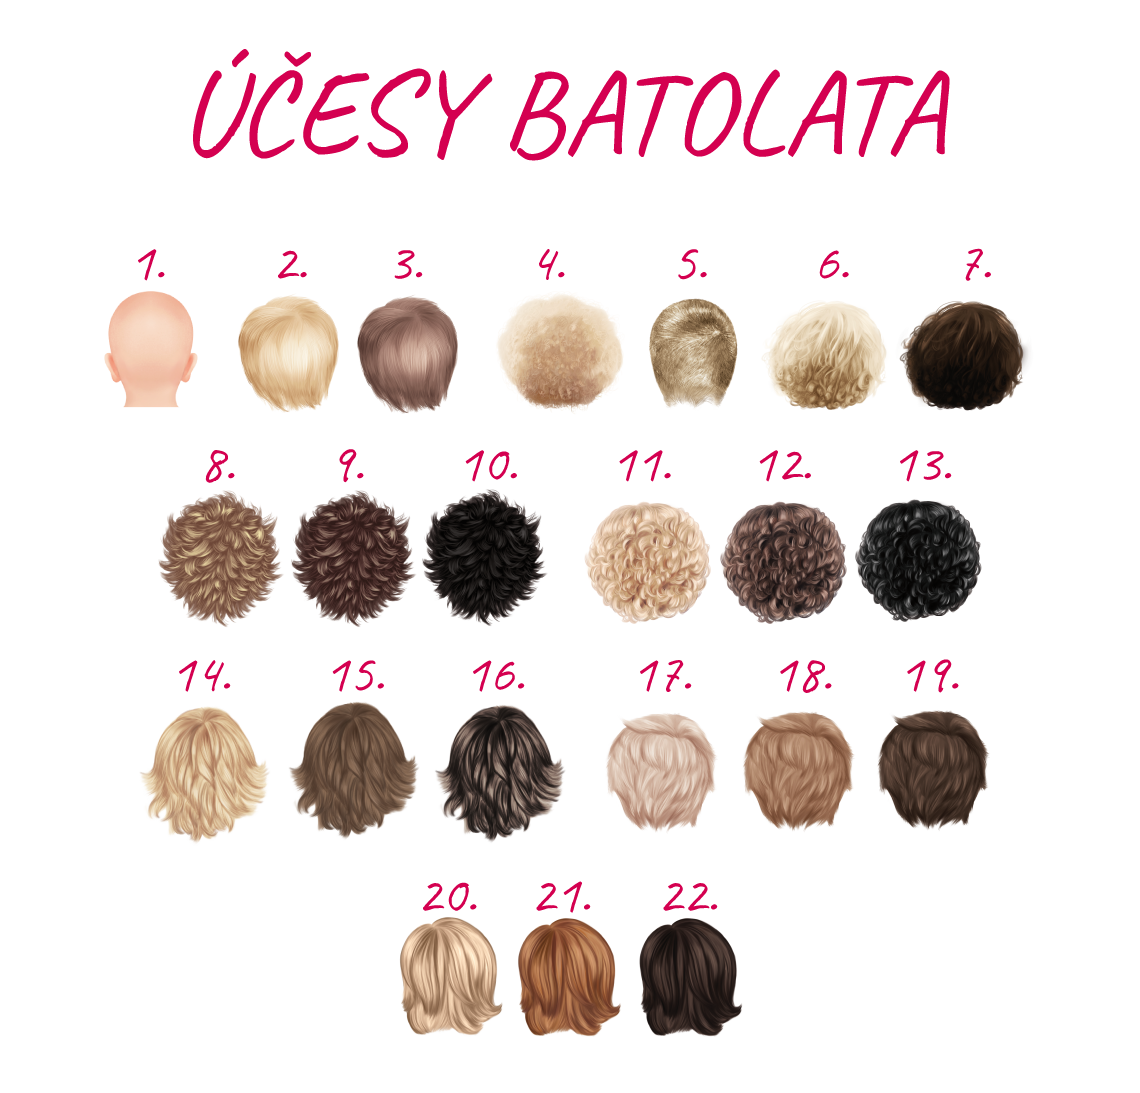 batole-ucesy-ESHOP